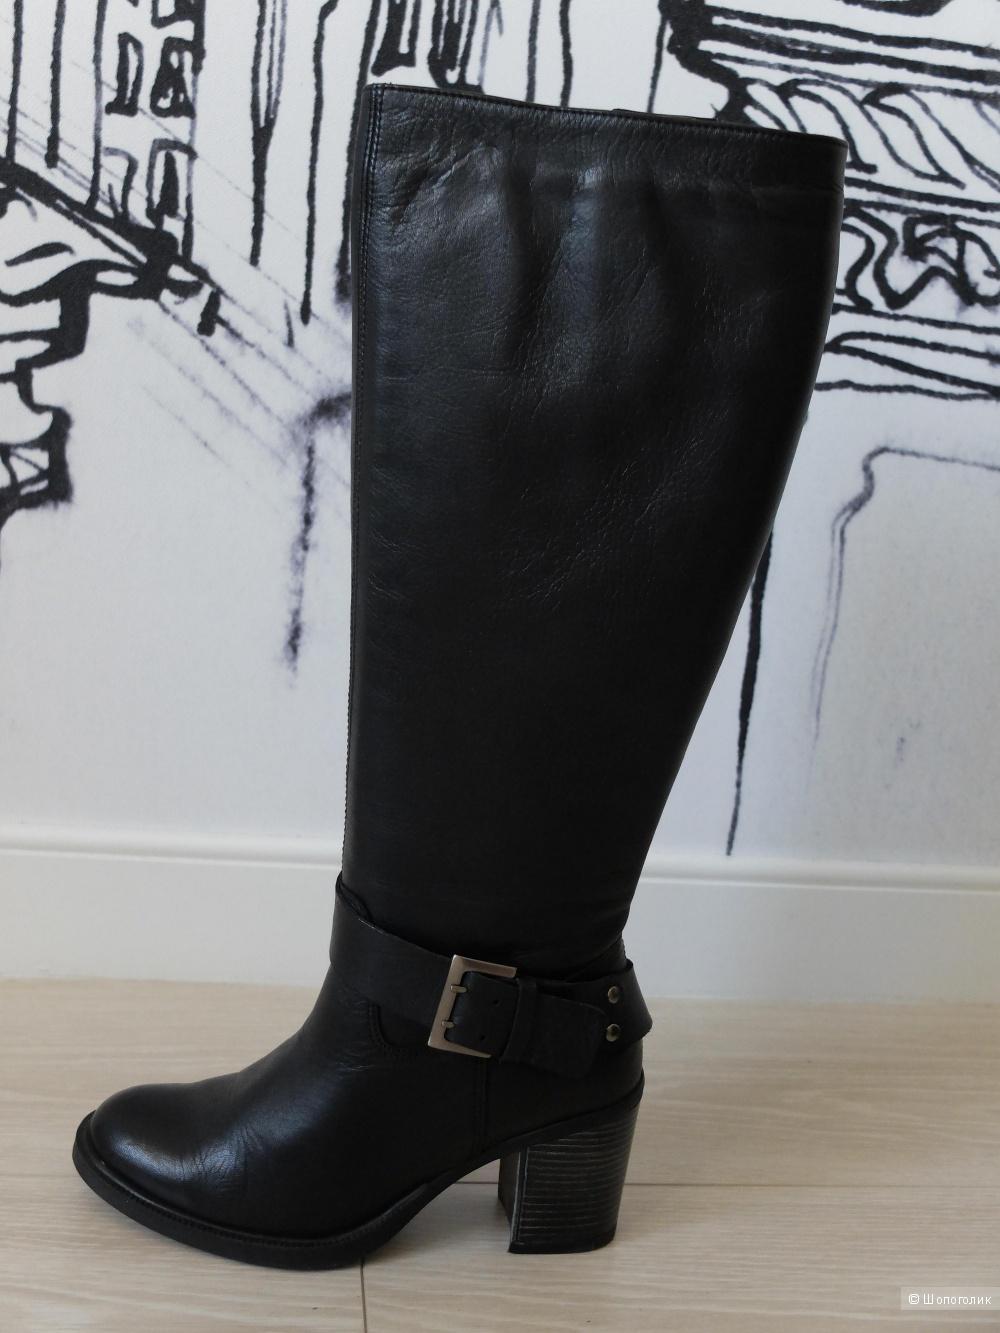 Сапоги Mario Ponti, 35-36 размер